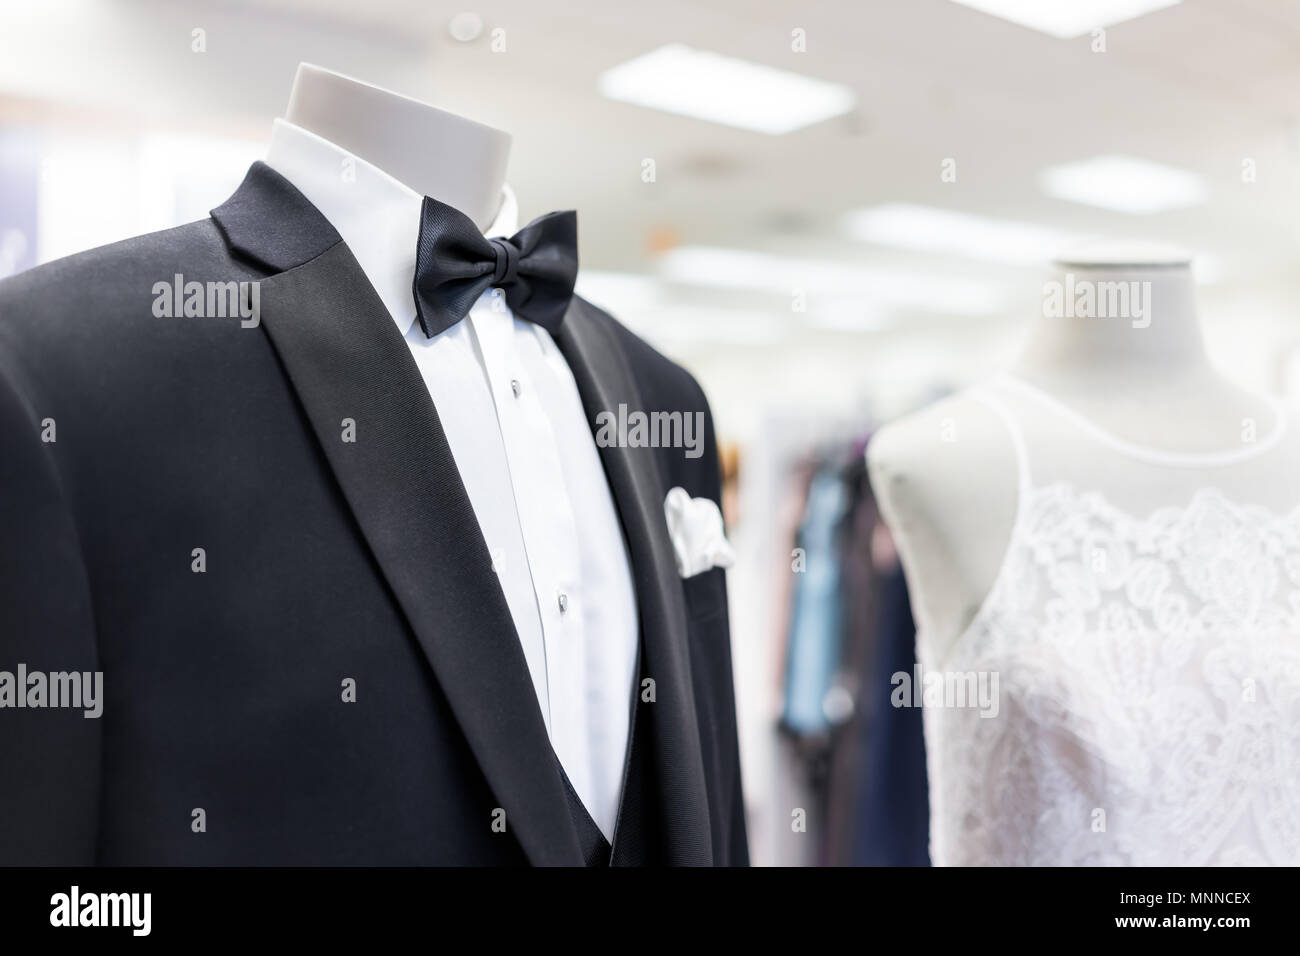 Primer plano de la novia y el novio maniqui en negro traje, traje de boda corbata de mariposa, la corbata y la bata blanca en la tienda boutique, tienda, pañuelo Imagen De Stock